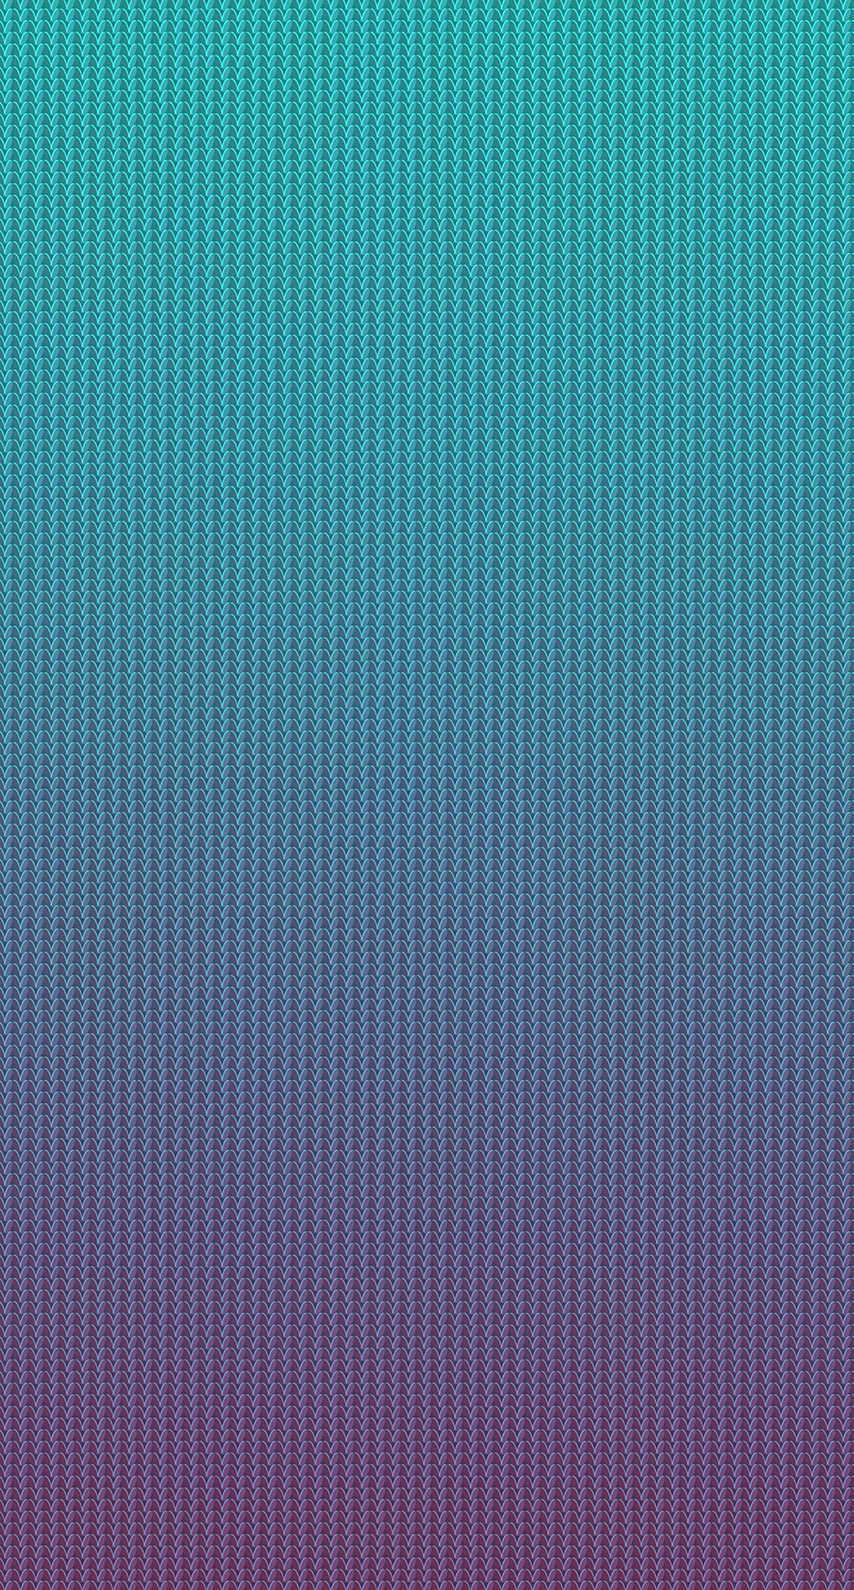 art, graphic, paper, design, background, wallpaper, desktop